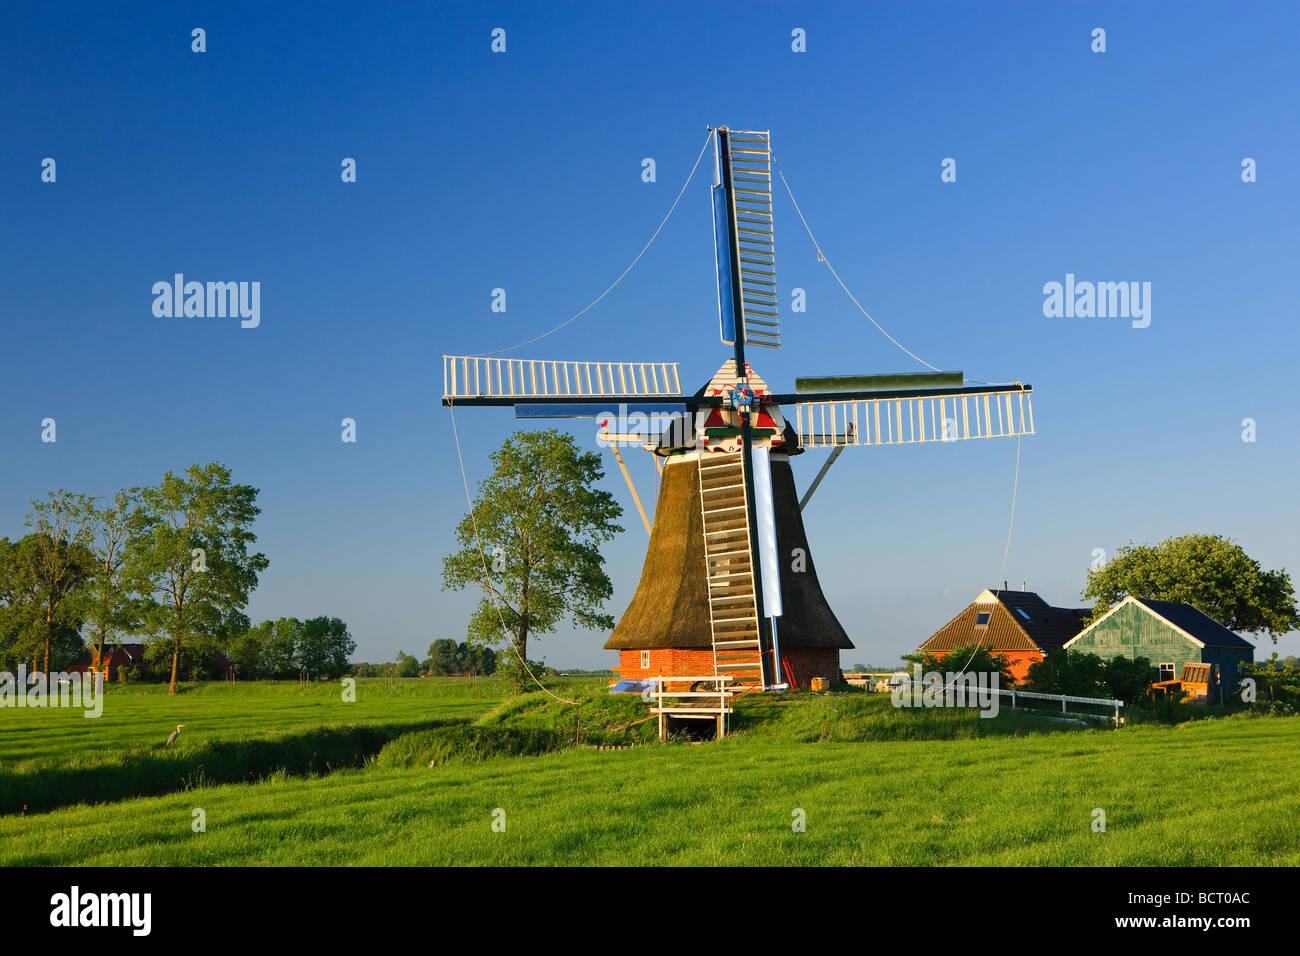 Windmill The Eolus, Aduard ,Groningen, Netherlands - Stock Image